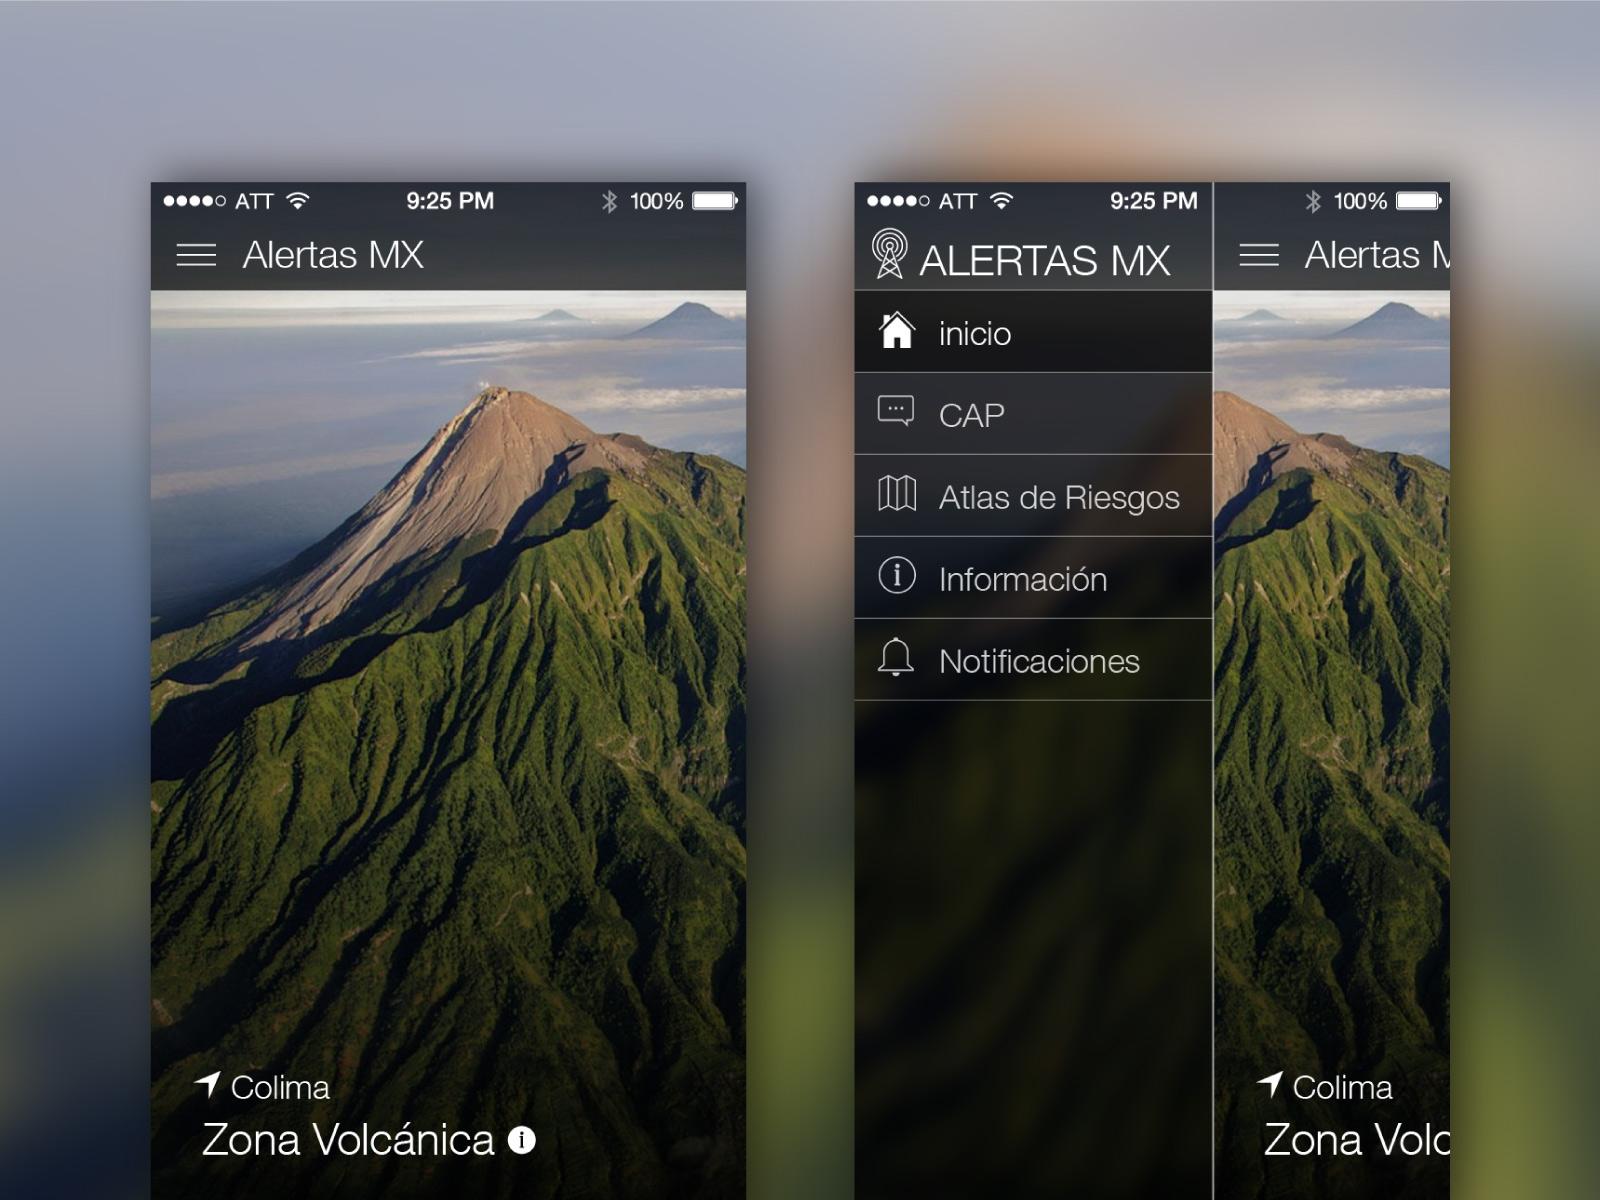 AlertasMX menu